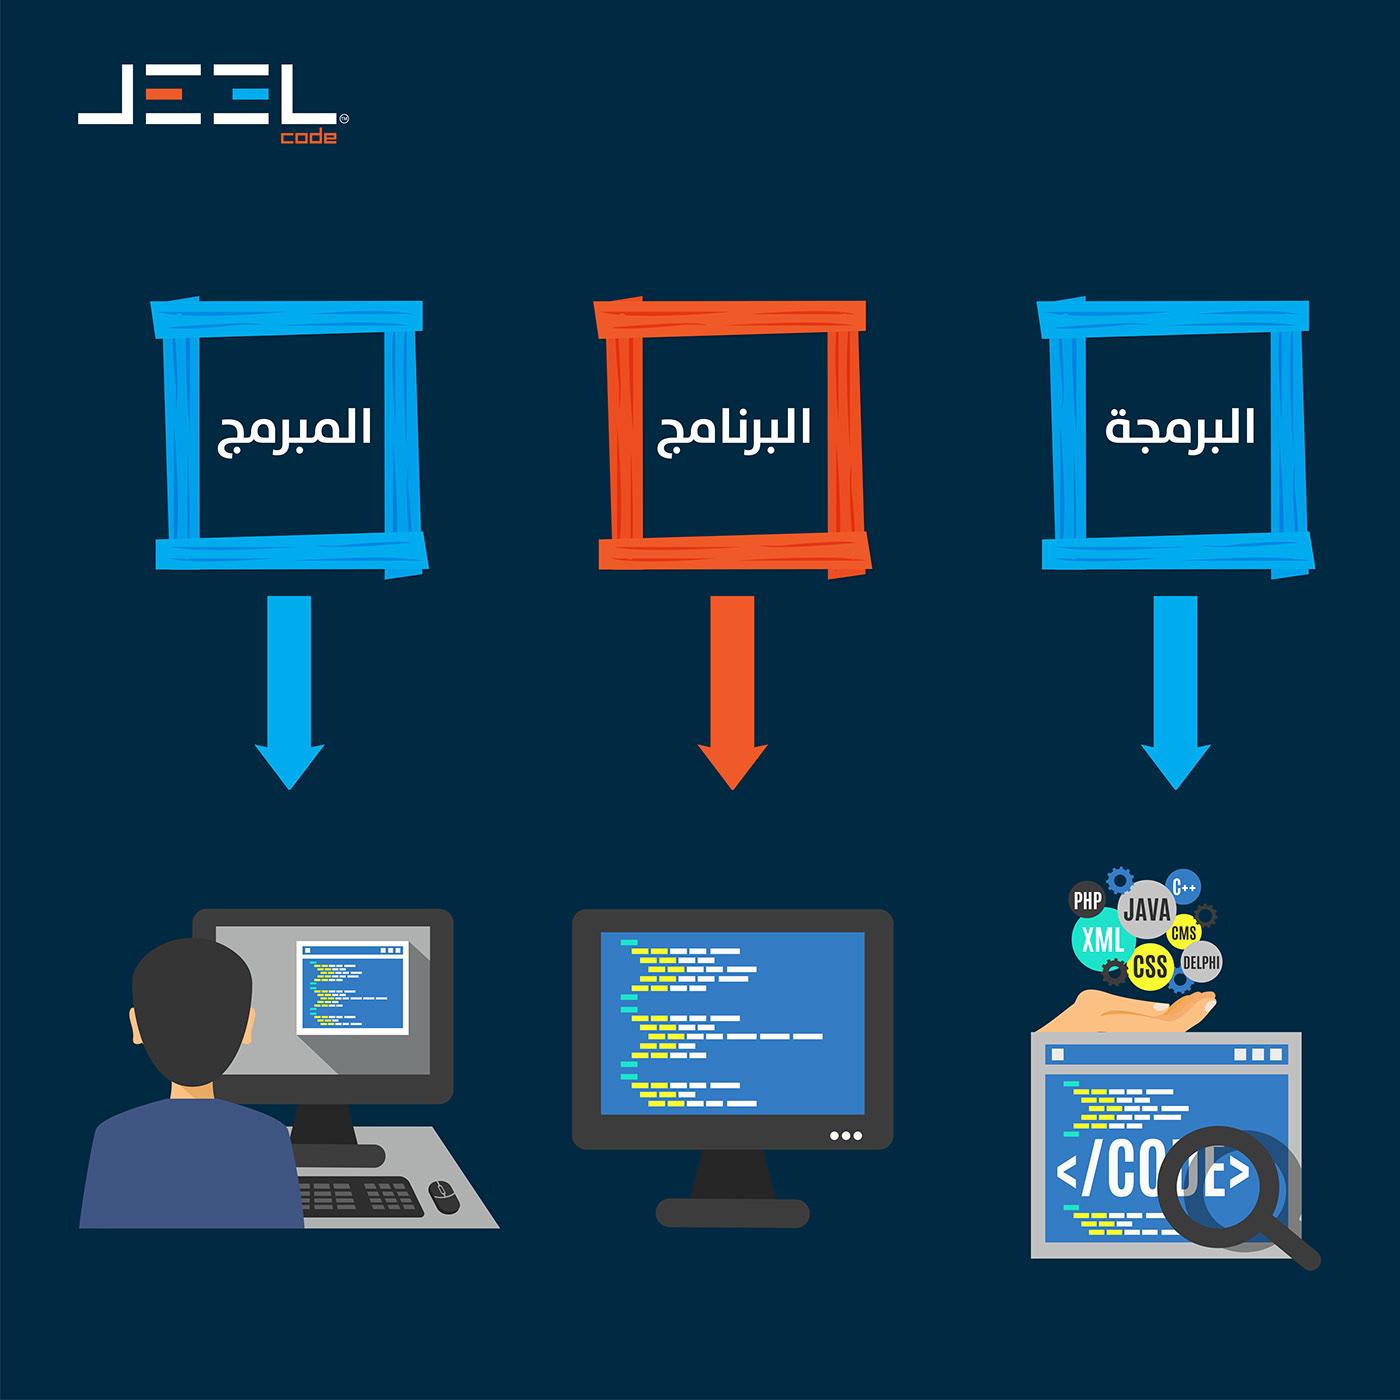 Image may contain: screenshot, computer and internet